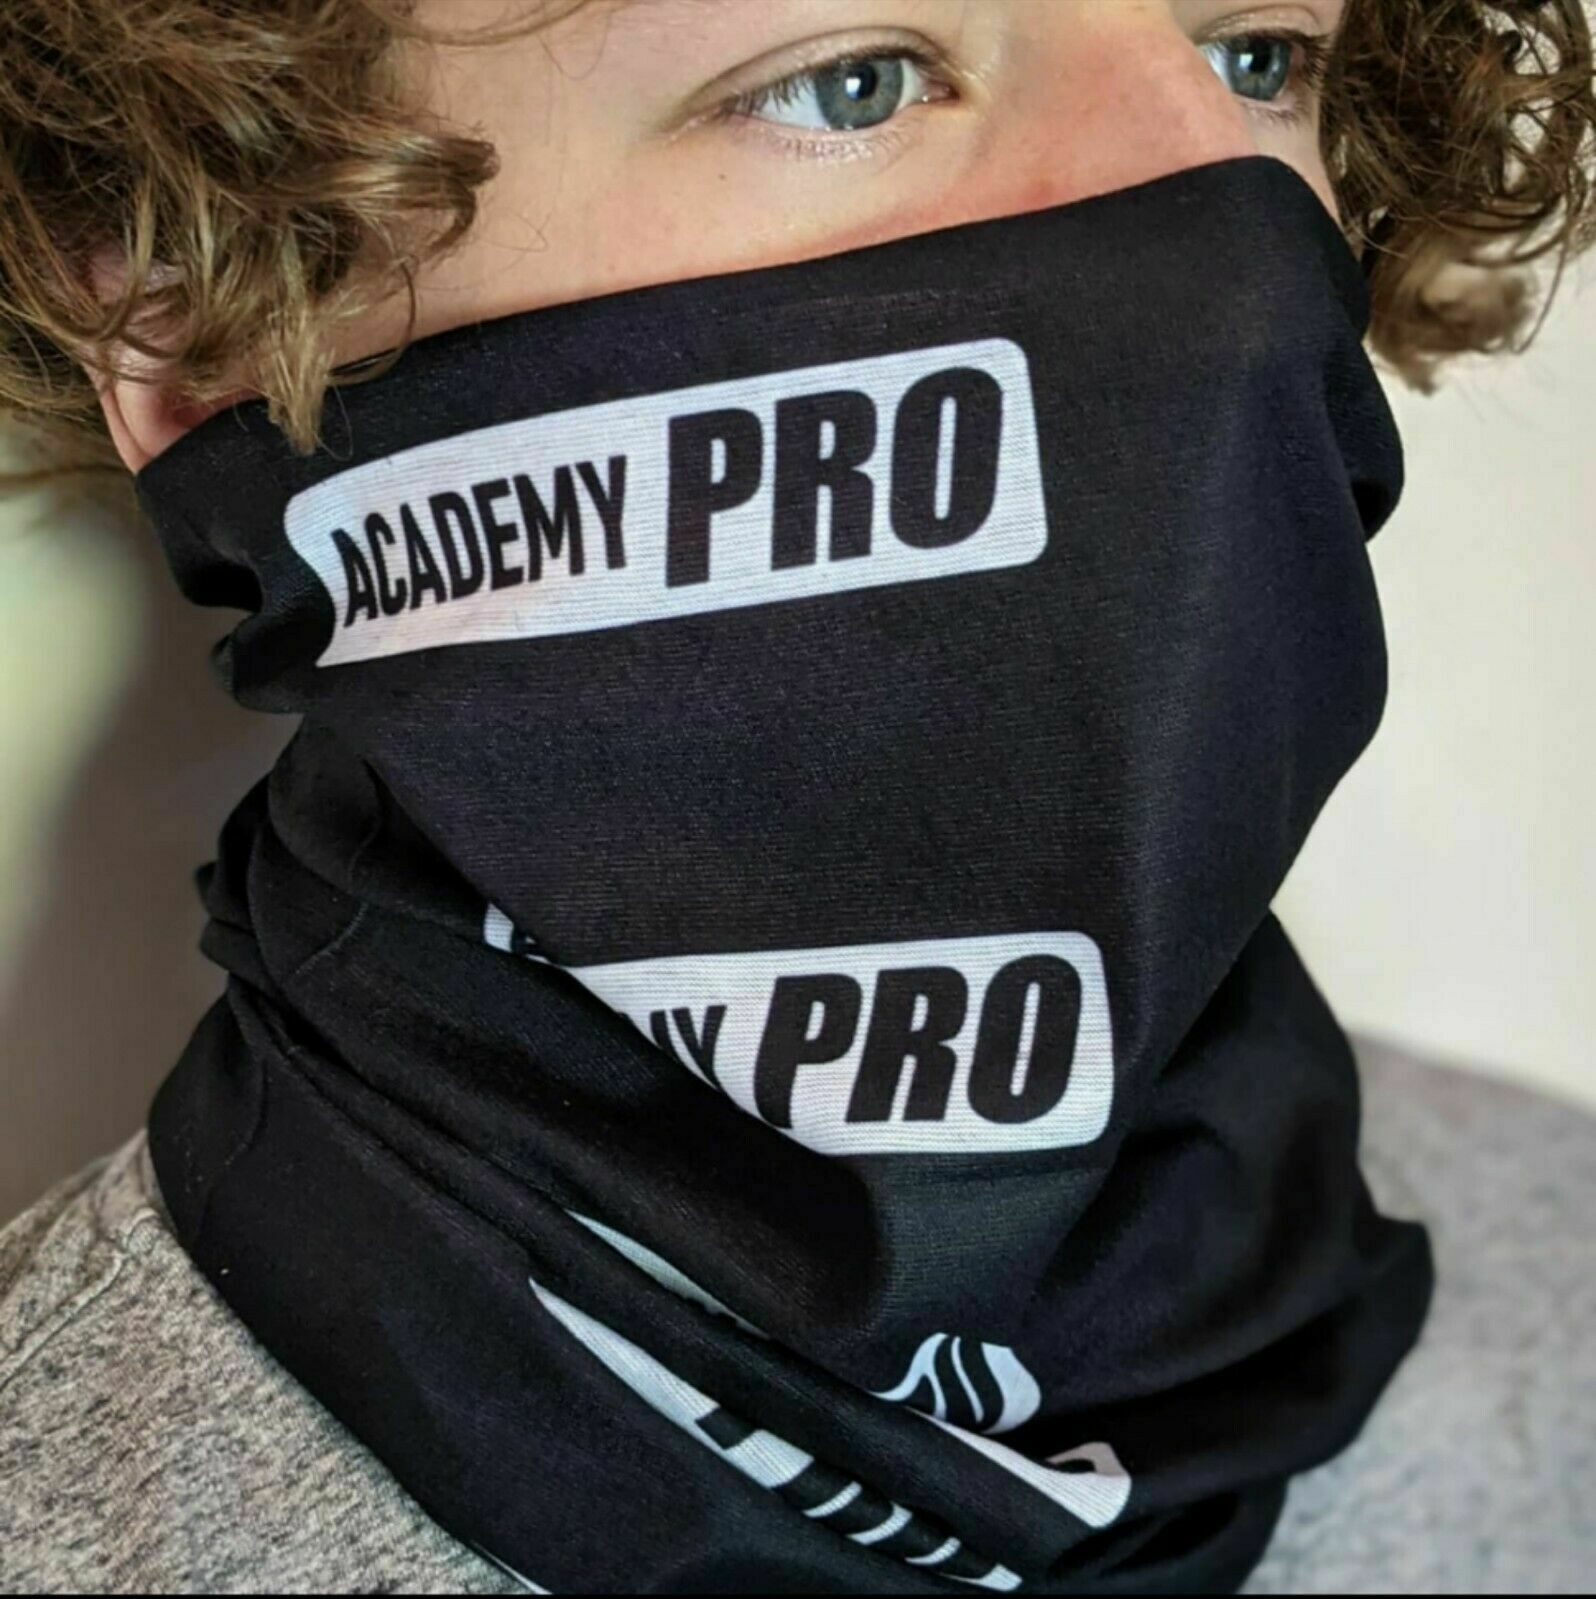 Academy Pro Multi-use Balaclava Face Mask Tube Snood Bandanna Headband